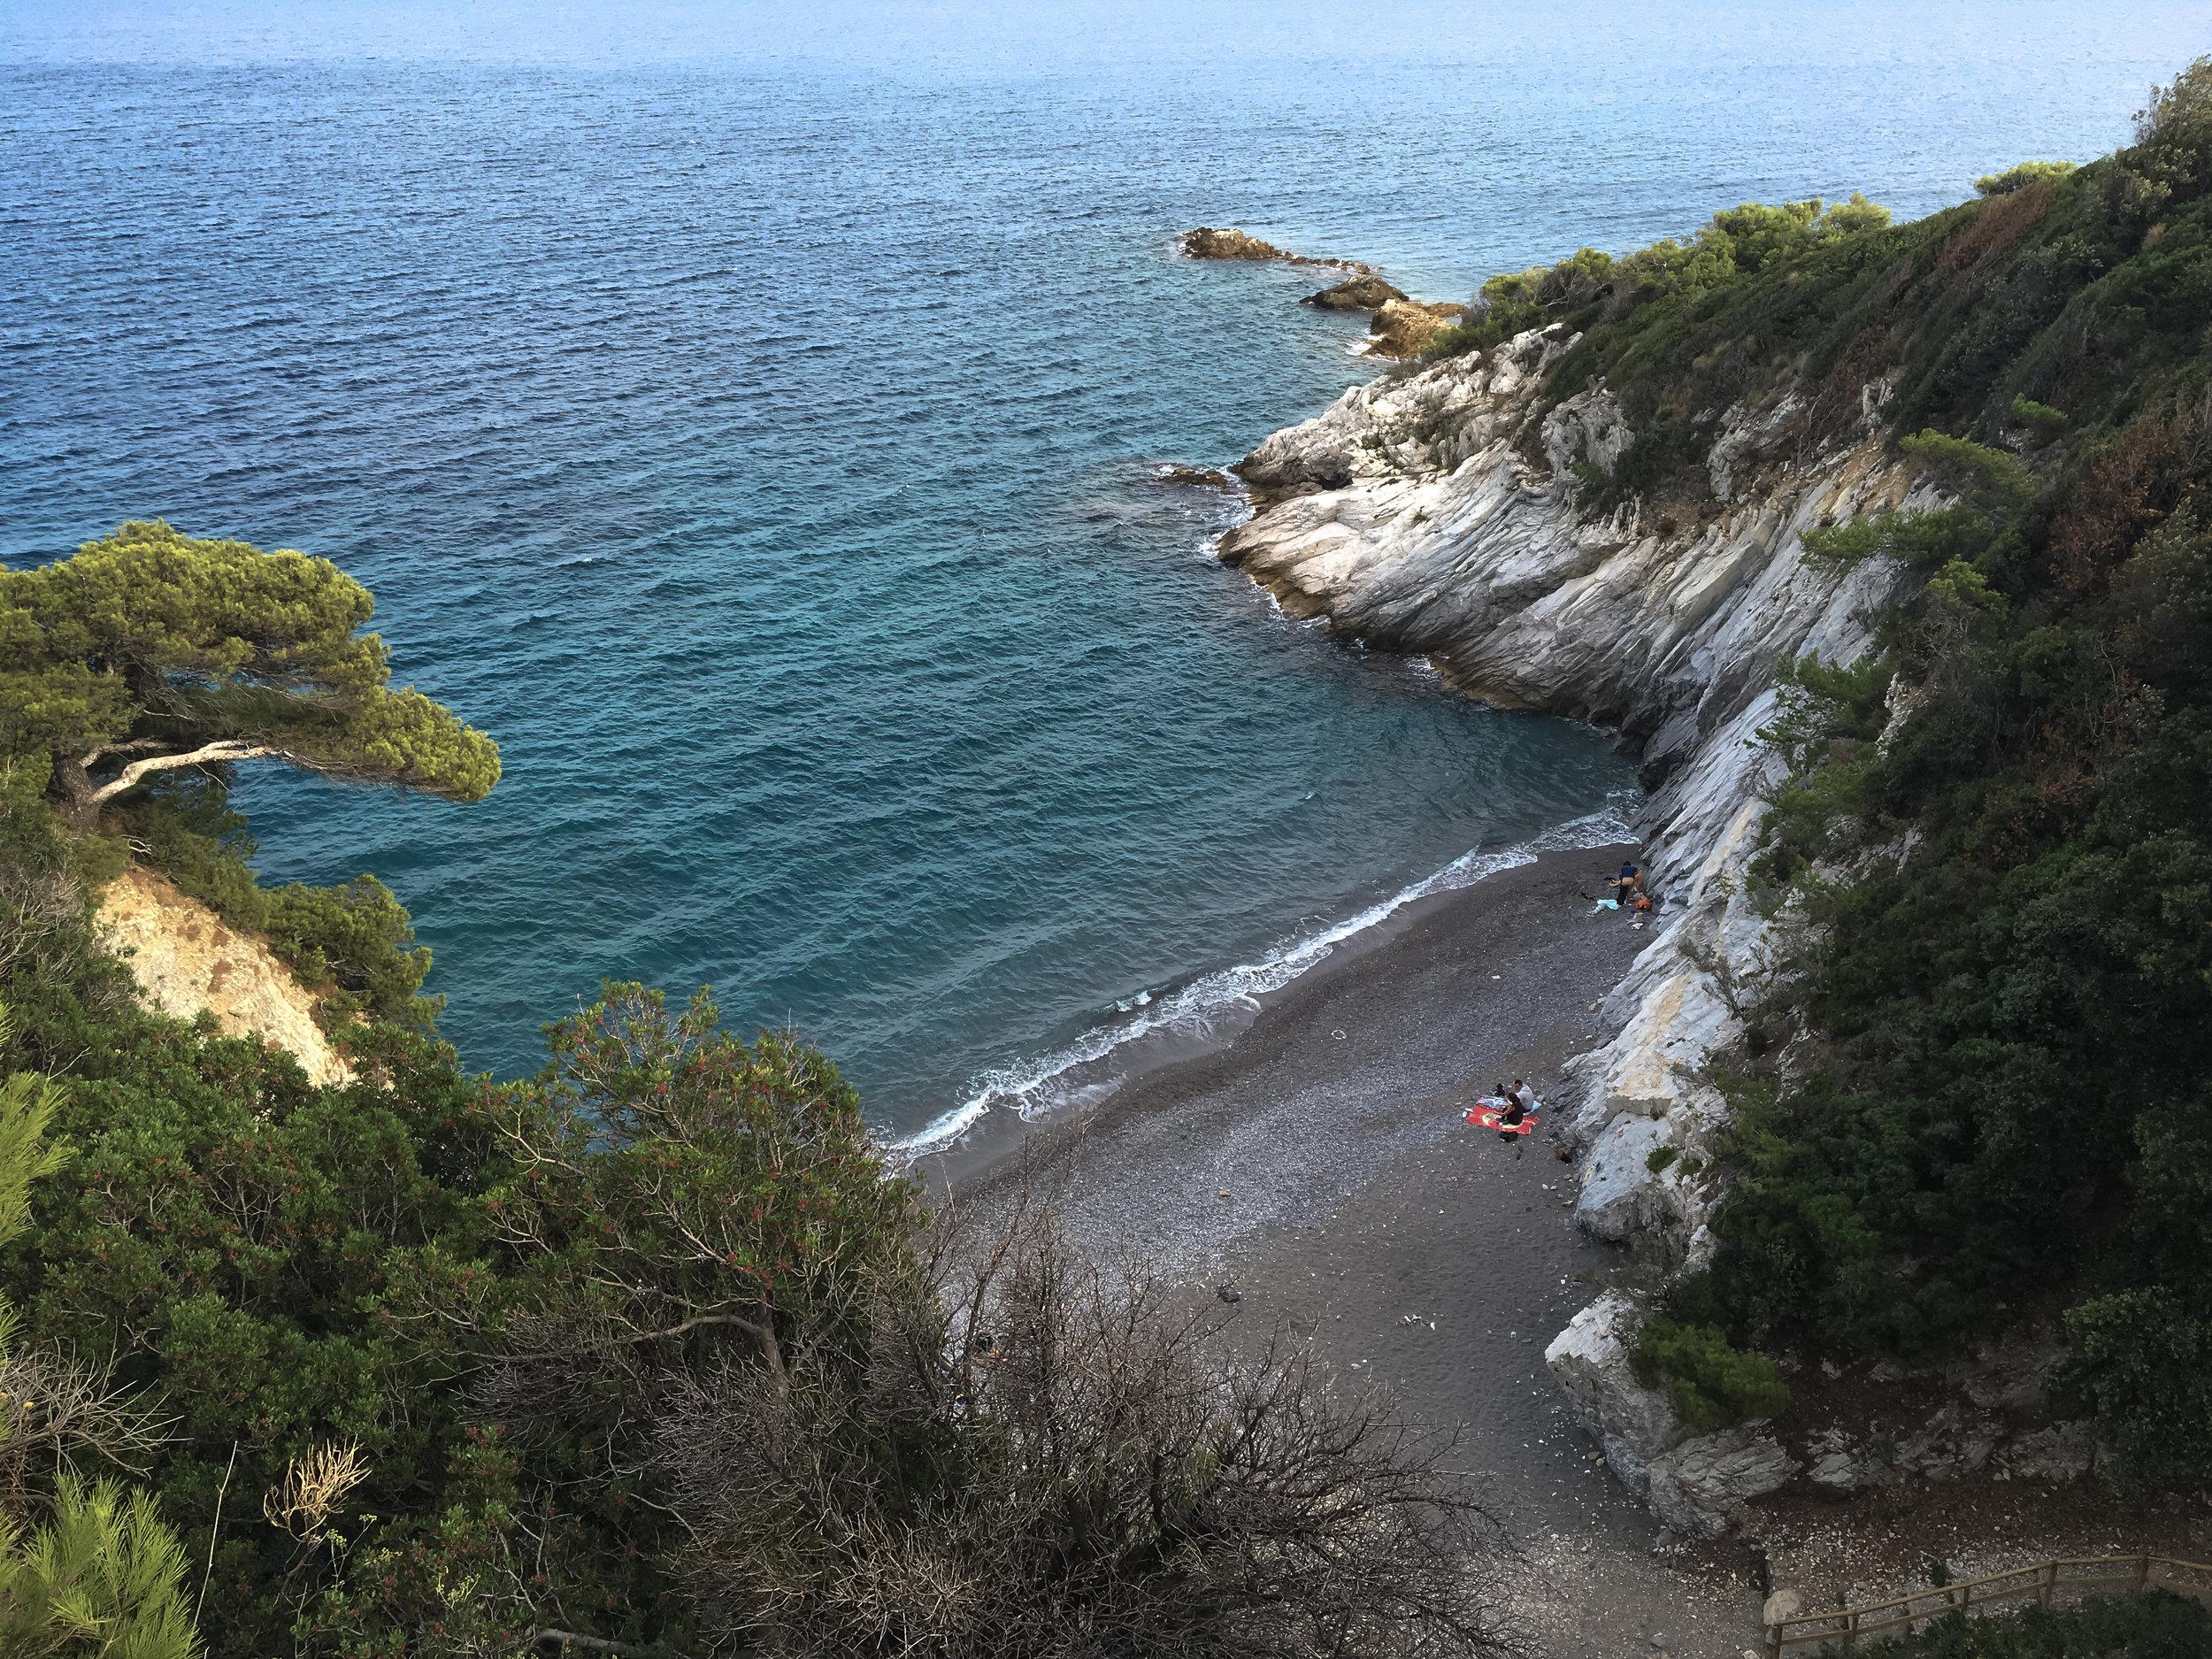 San remo, Imperia, Liguria, Italy, Italian Riviera, Travel, Blog